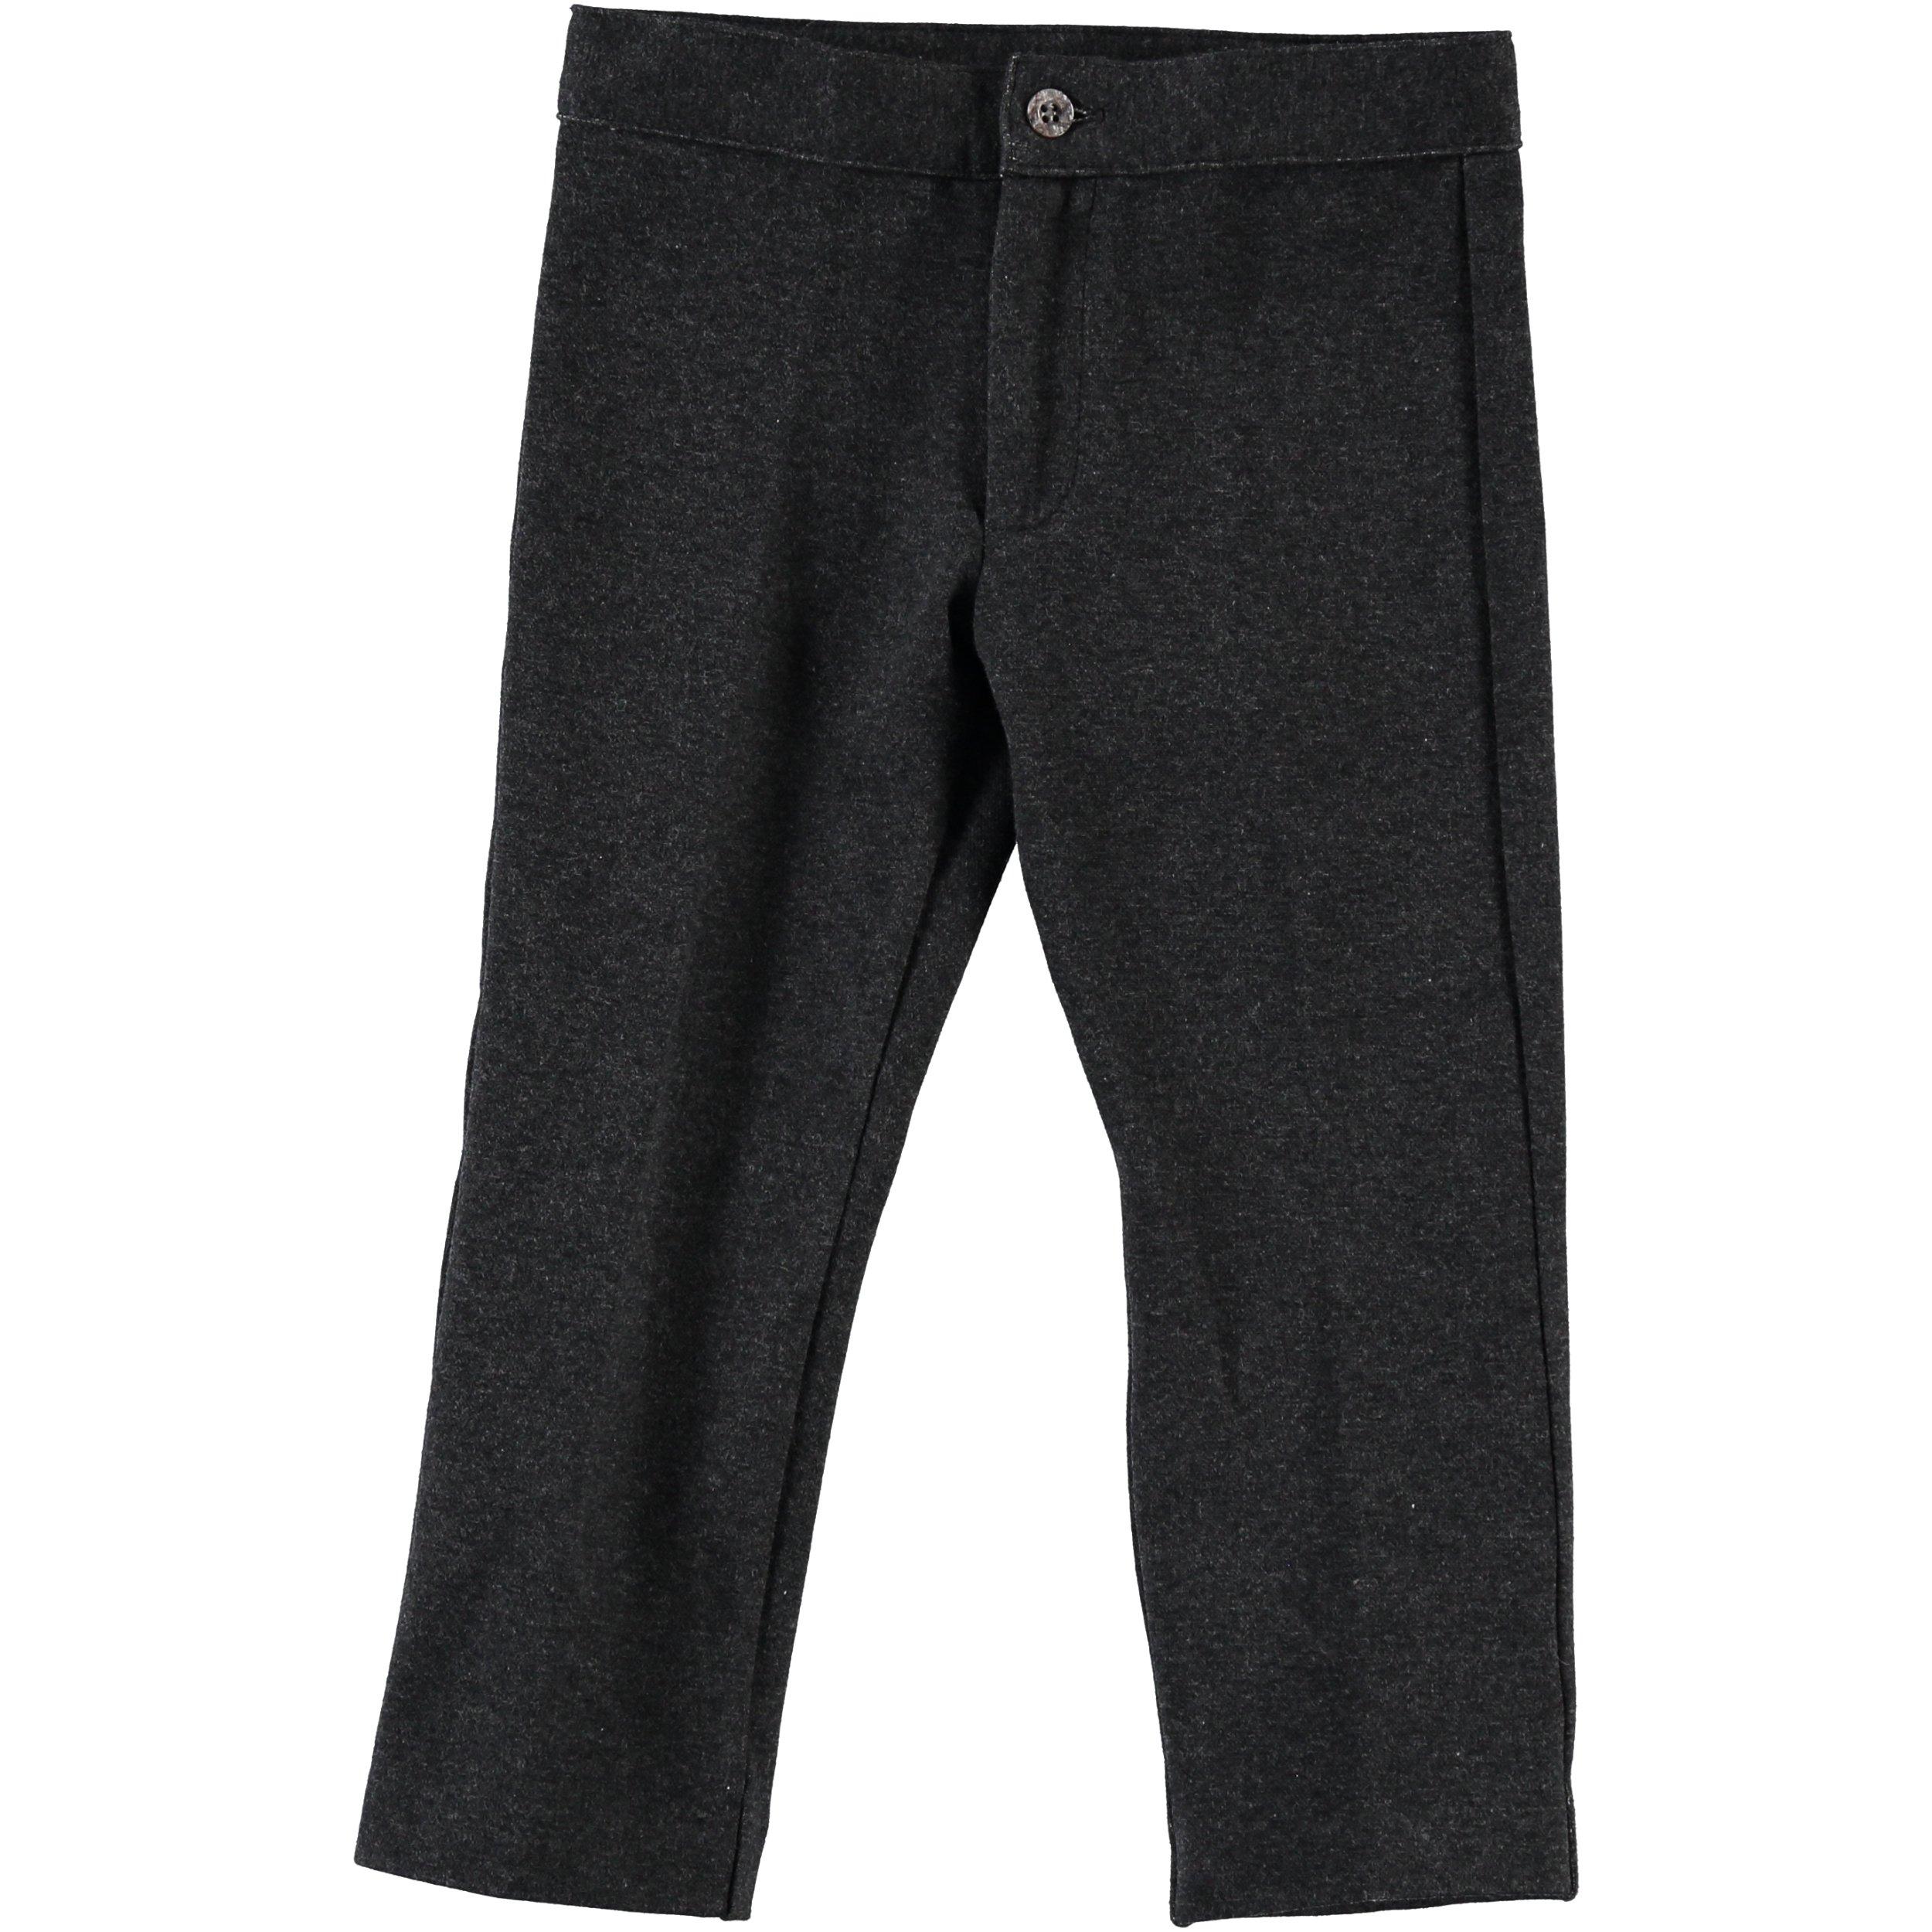 Piccino Piccina Boys Grey Dress Pants- w/o Pockets